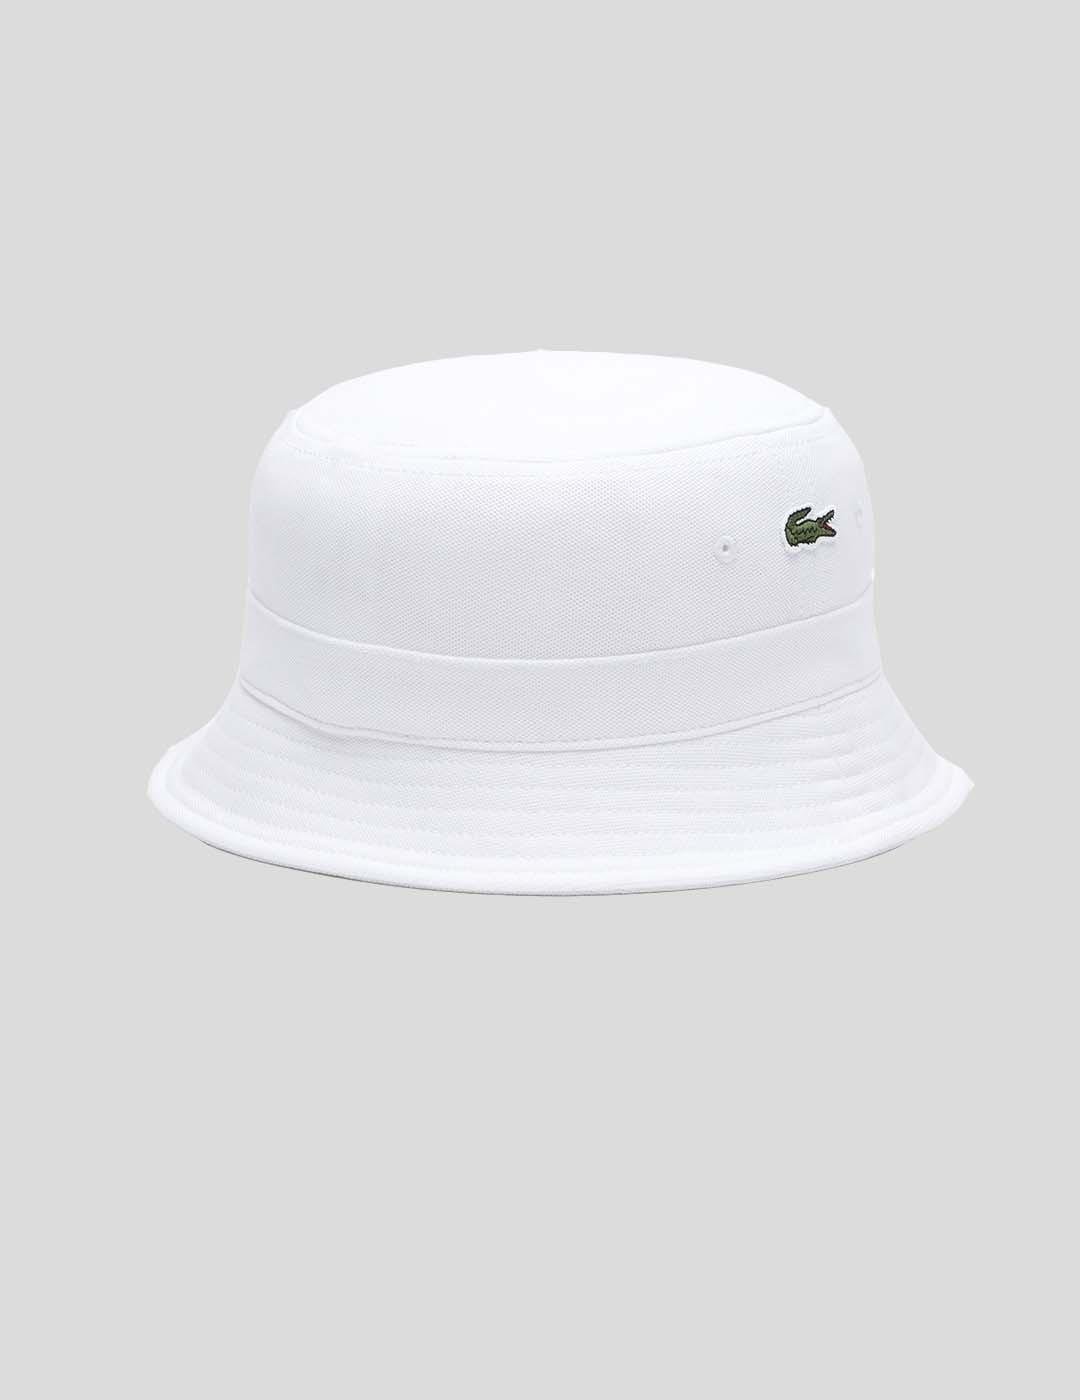 GORRA LACOSTE RK2056 BUCKET HAT BLANC